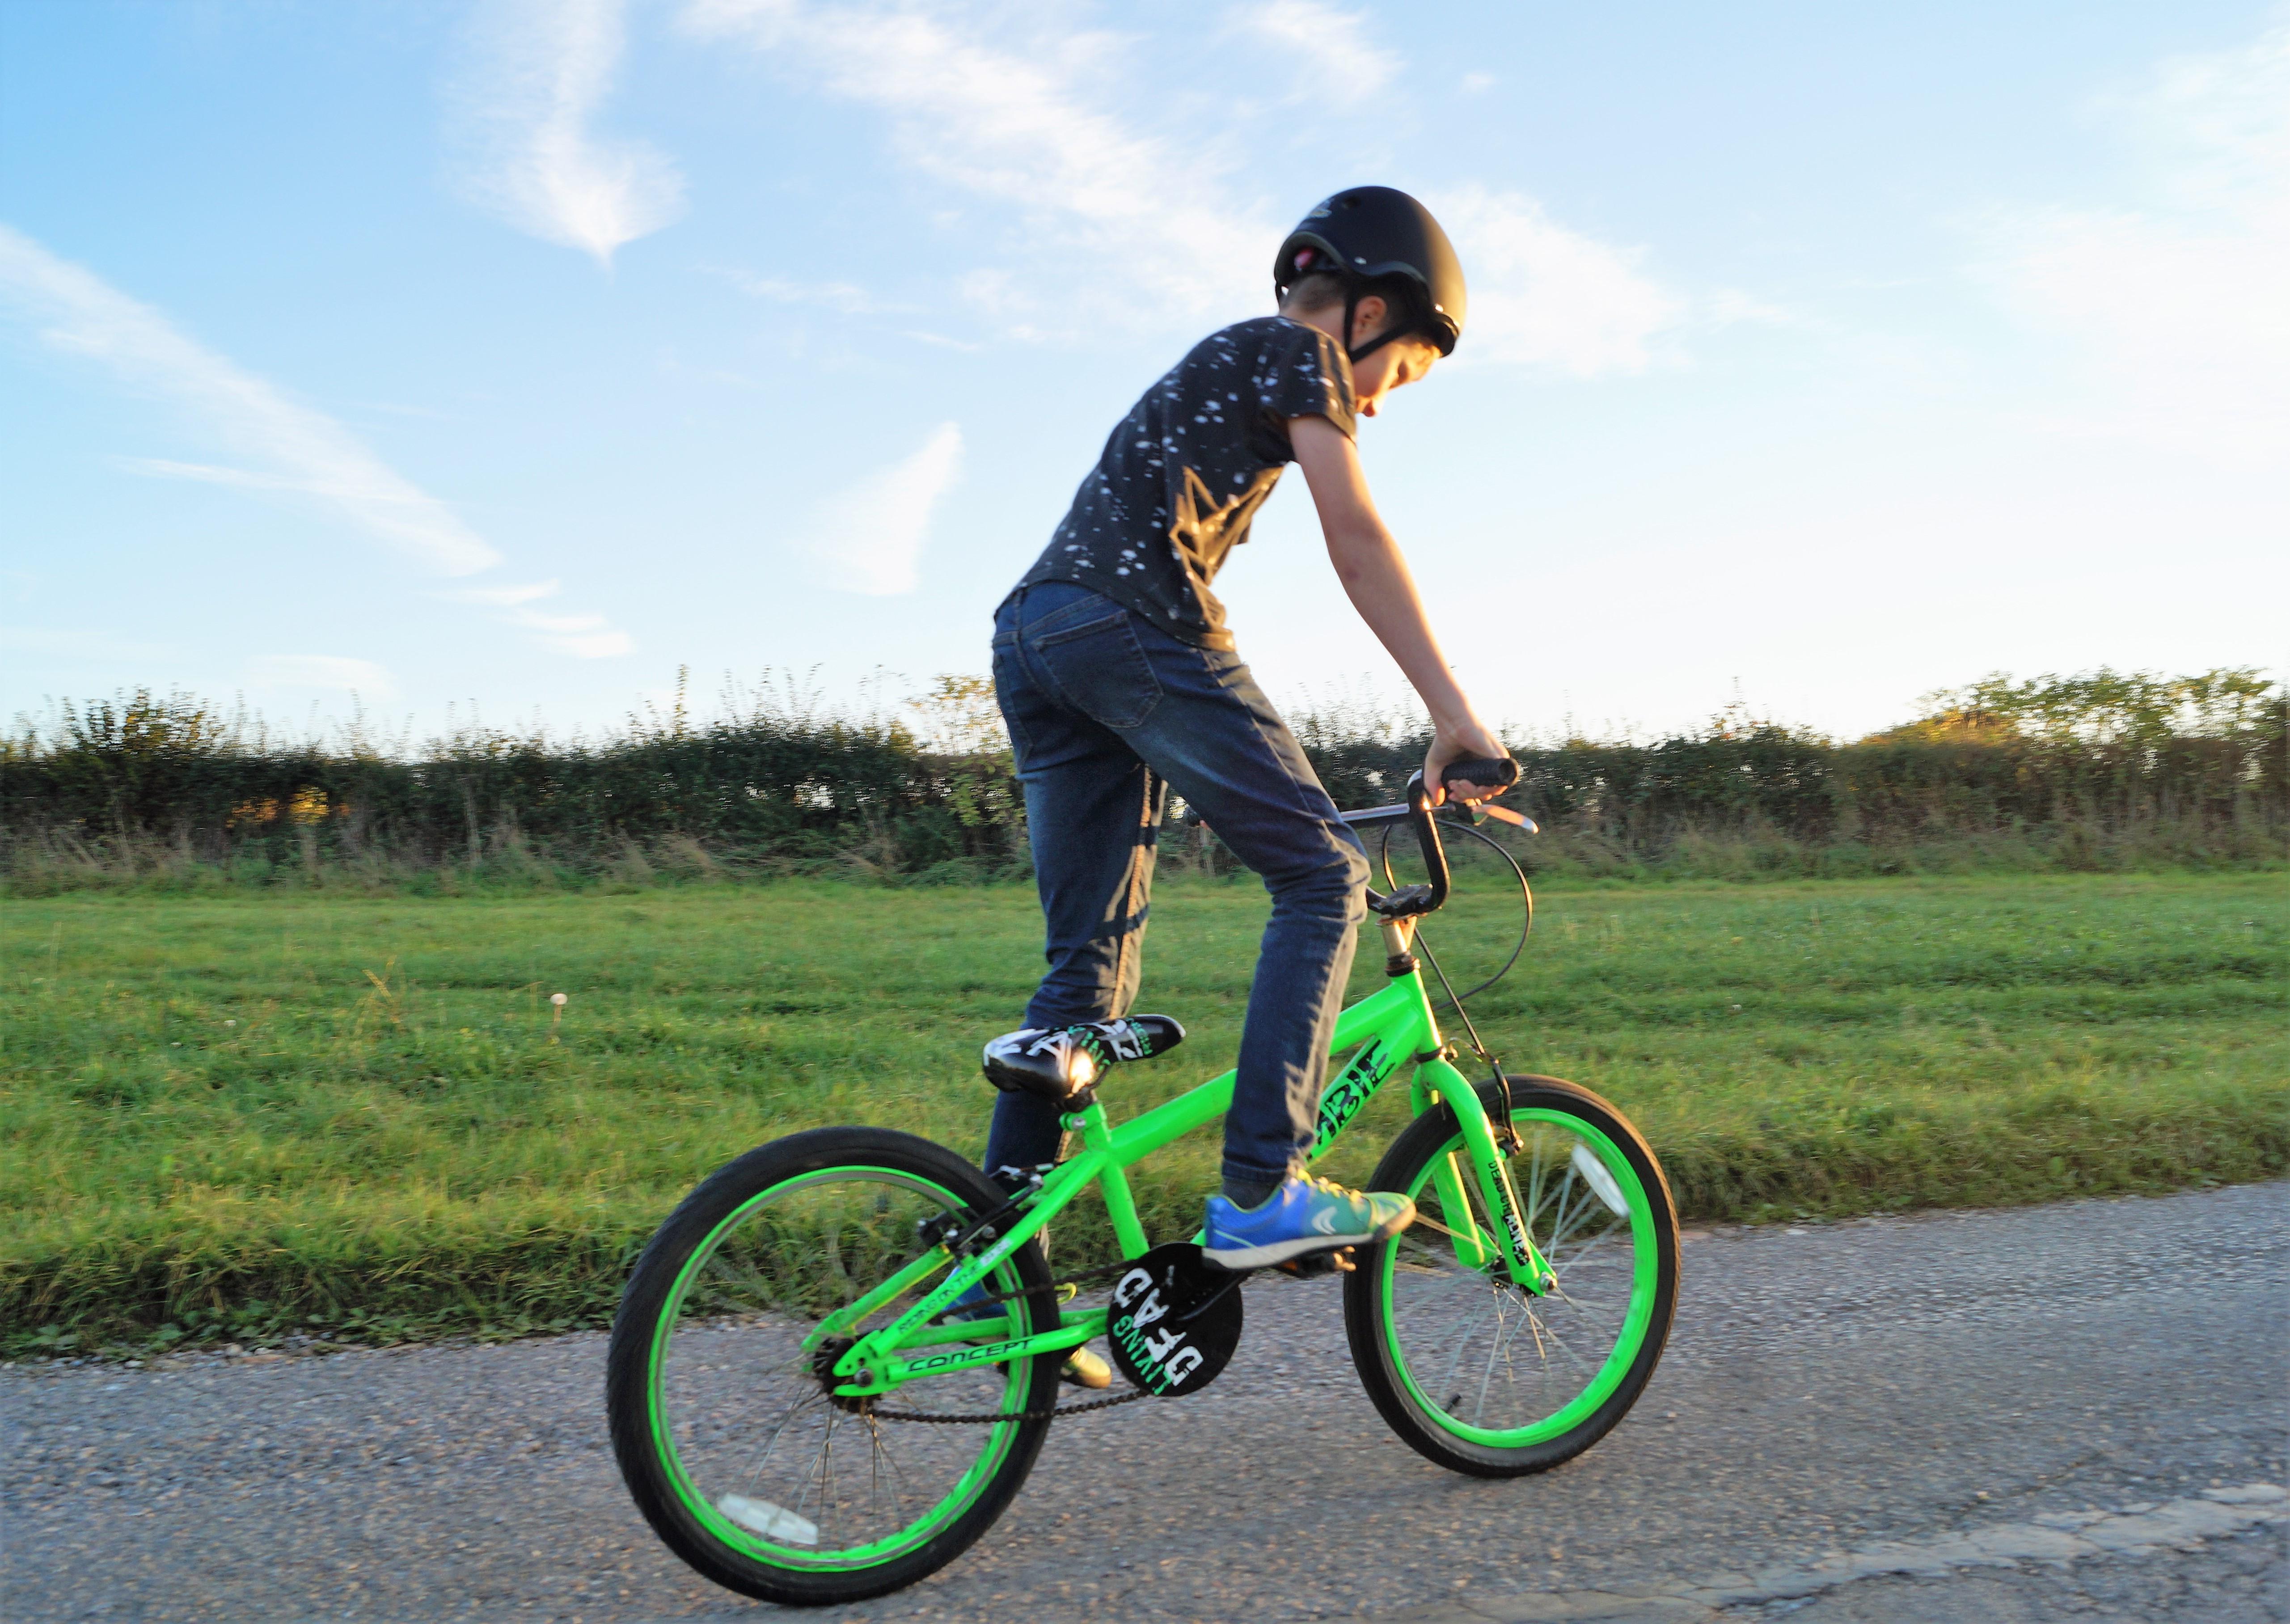 Mini Hornit Cycle Helmet